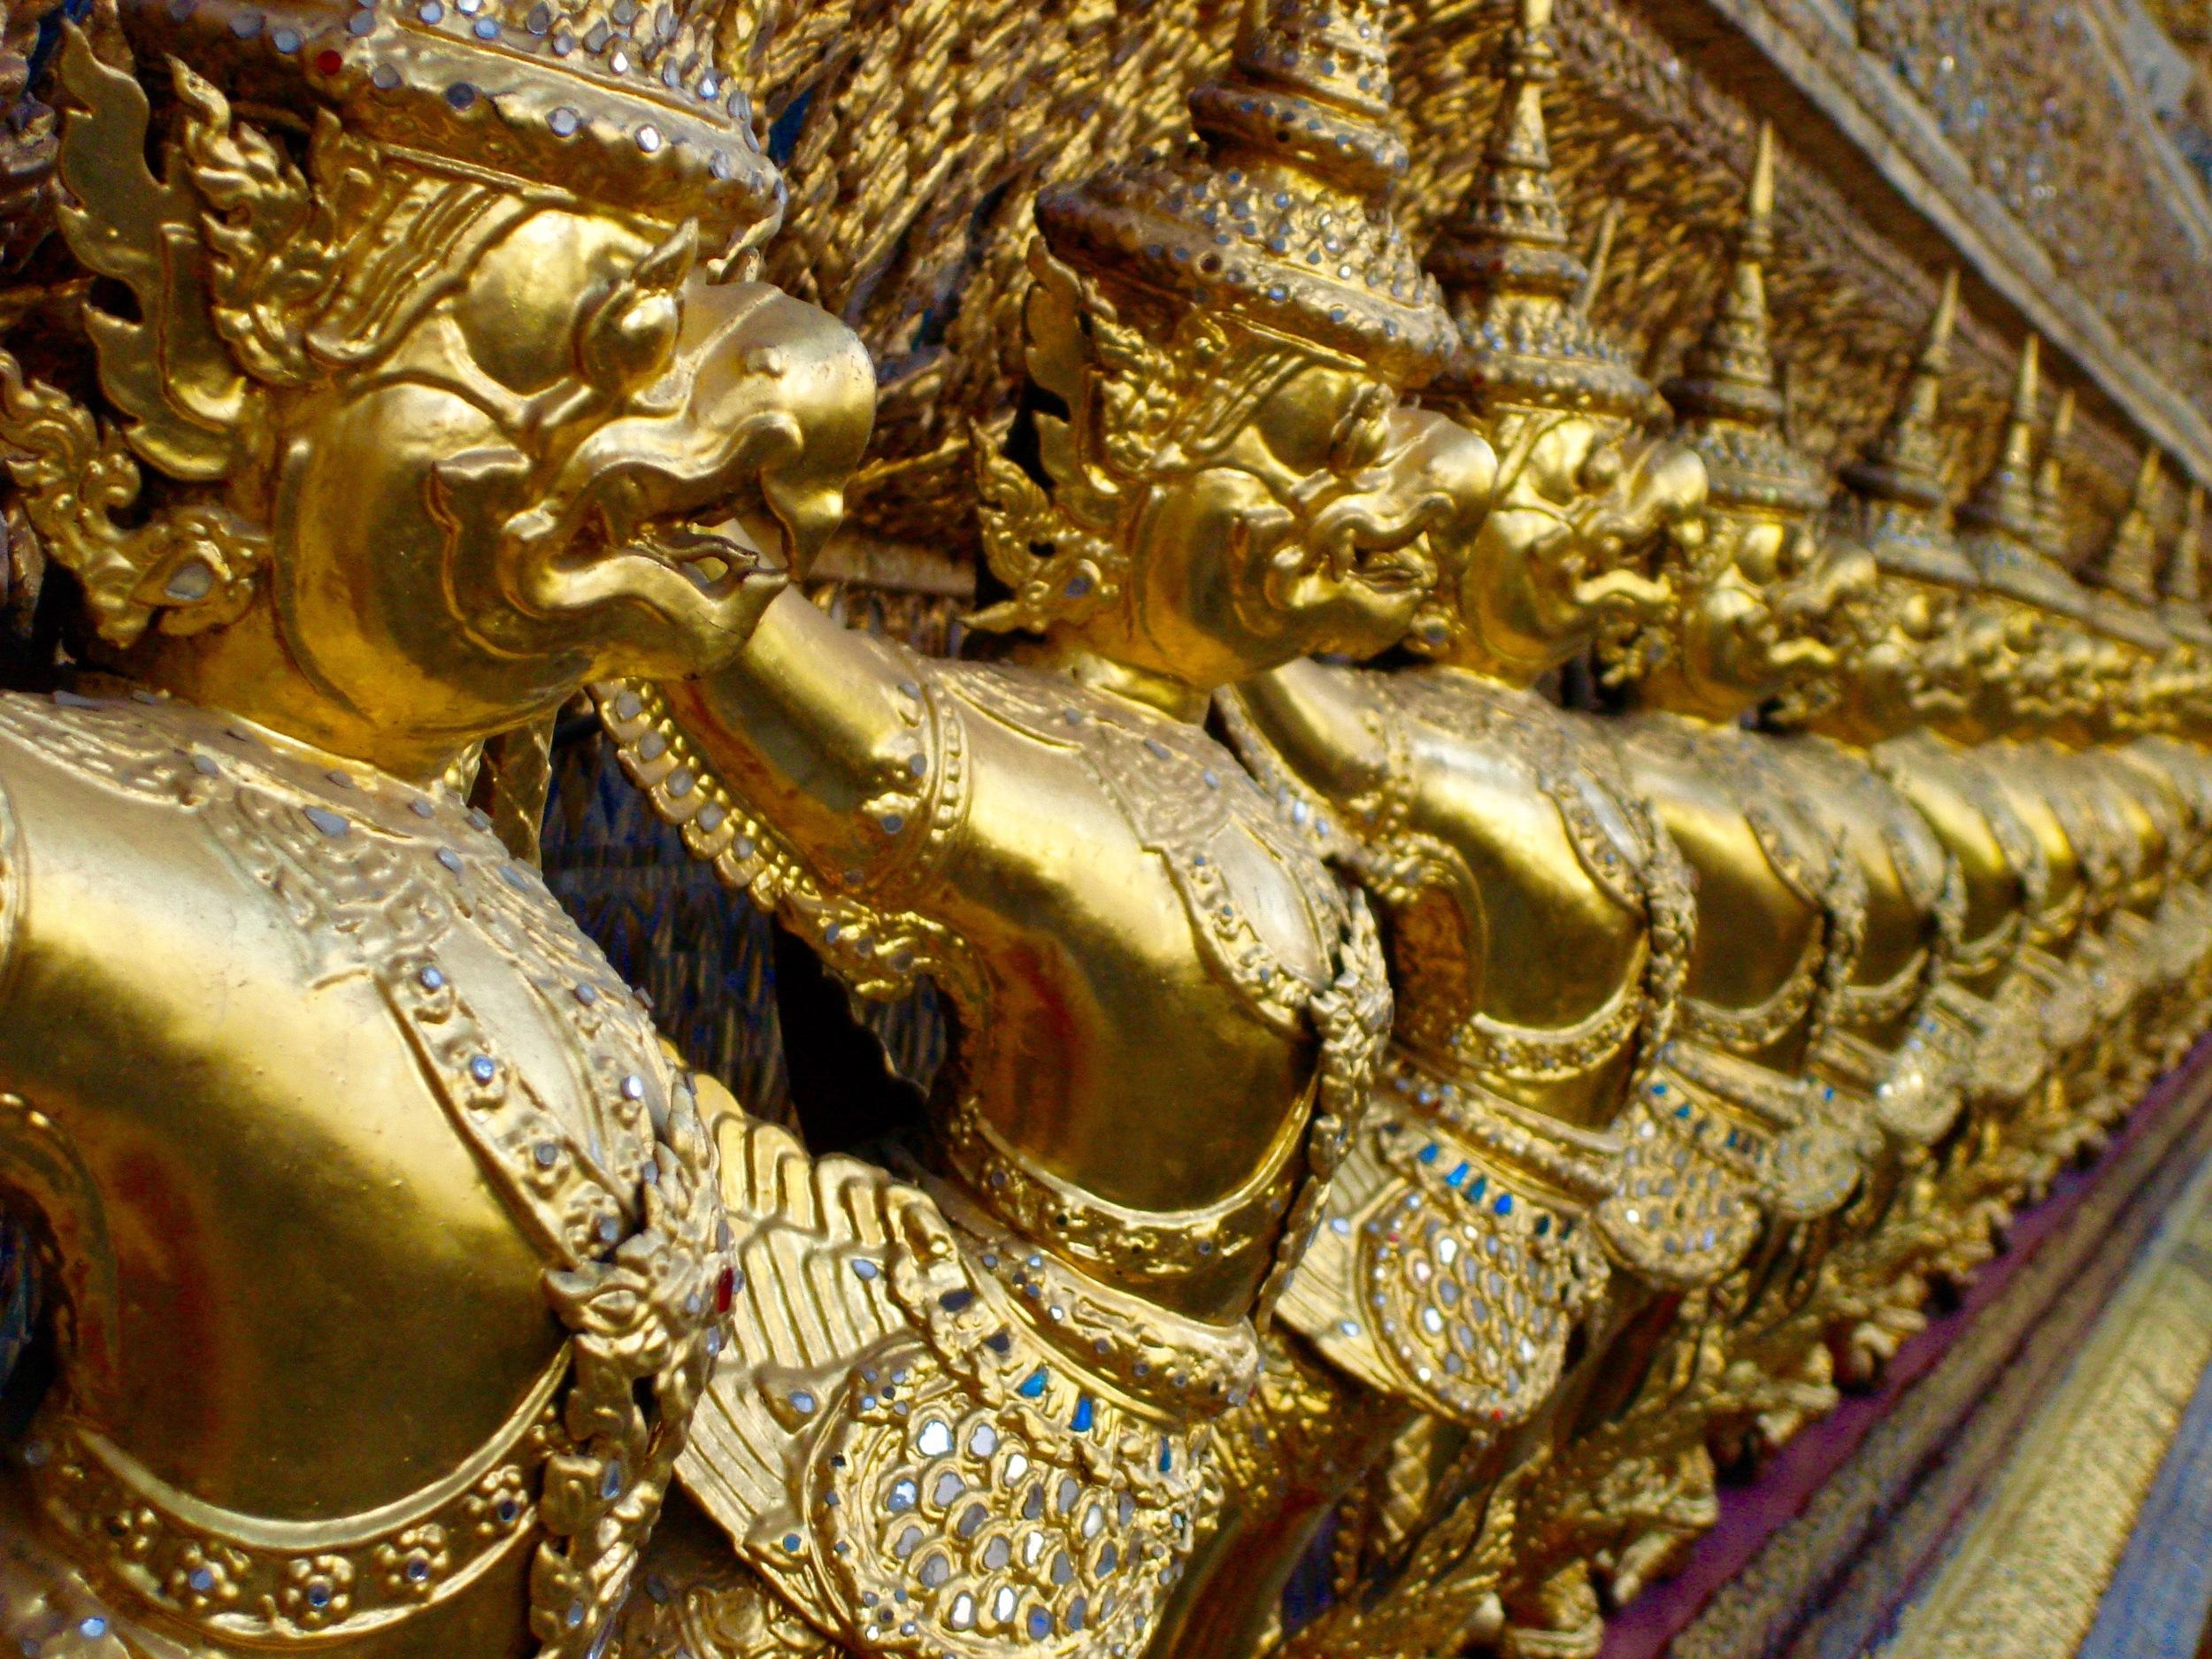 Golden Facade at the Grand Palace, Bangkok Thailand - 3 Days*